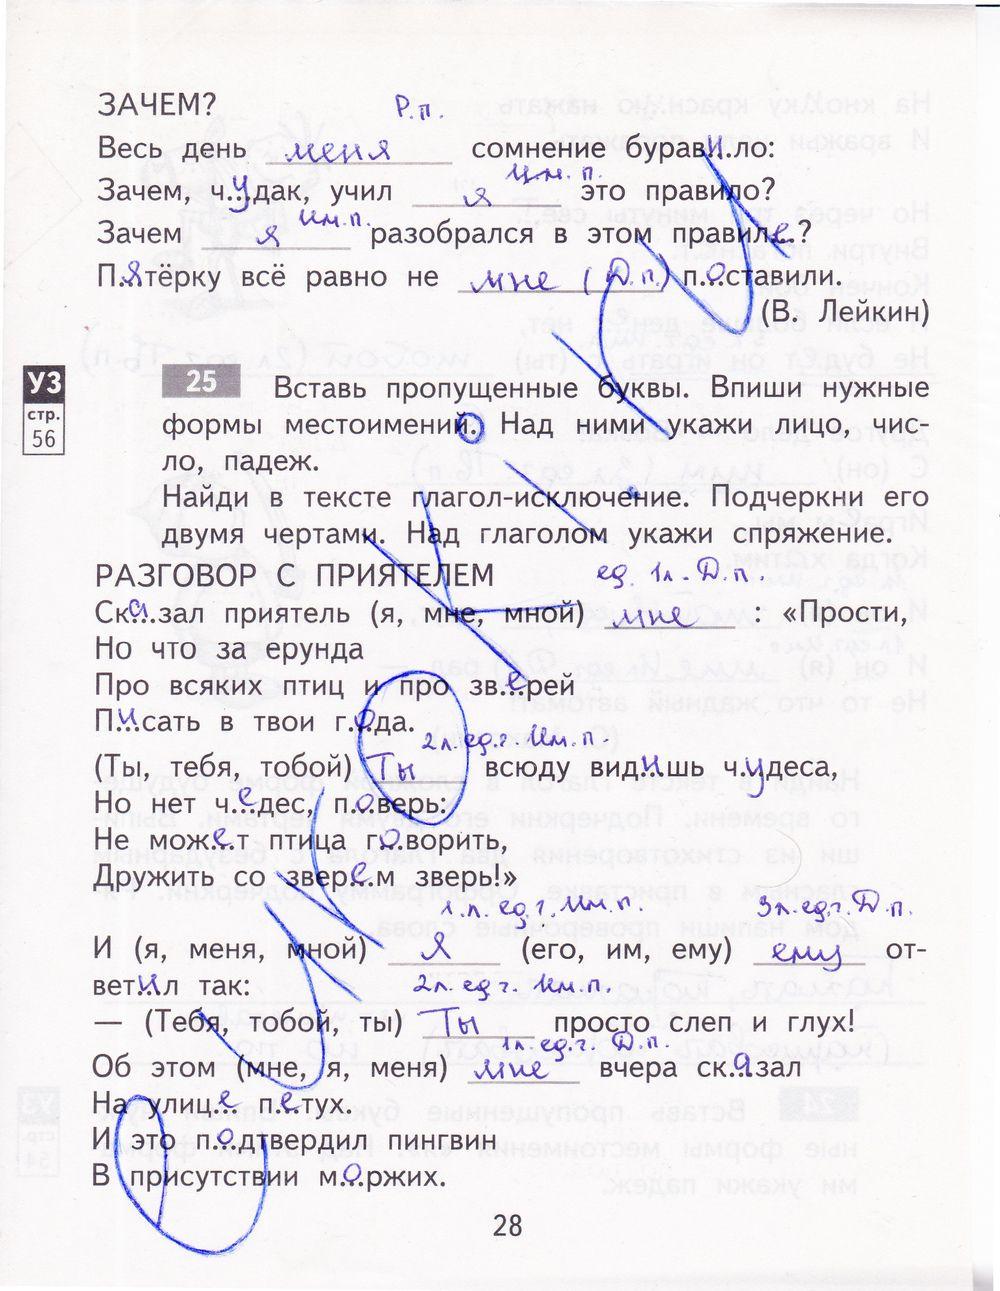 Домашнее задание 3 класс математика slovo.ws багданович